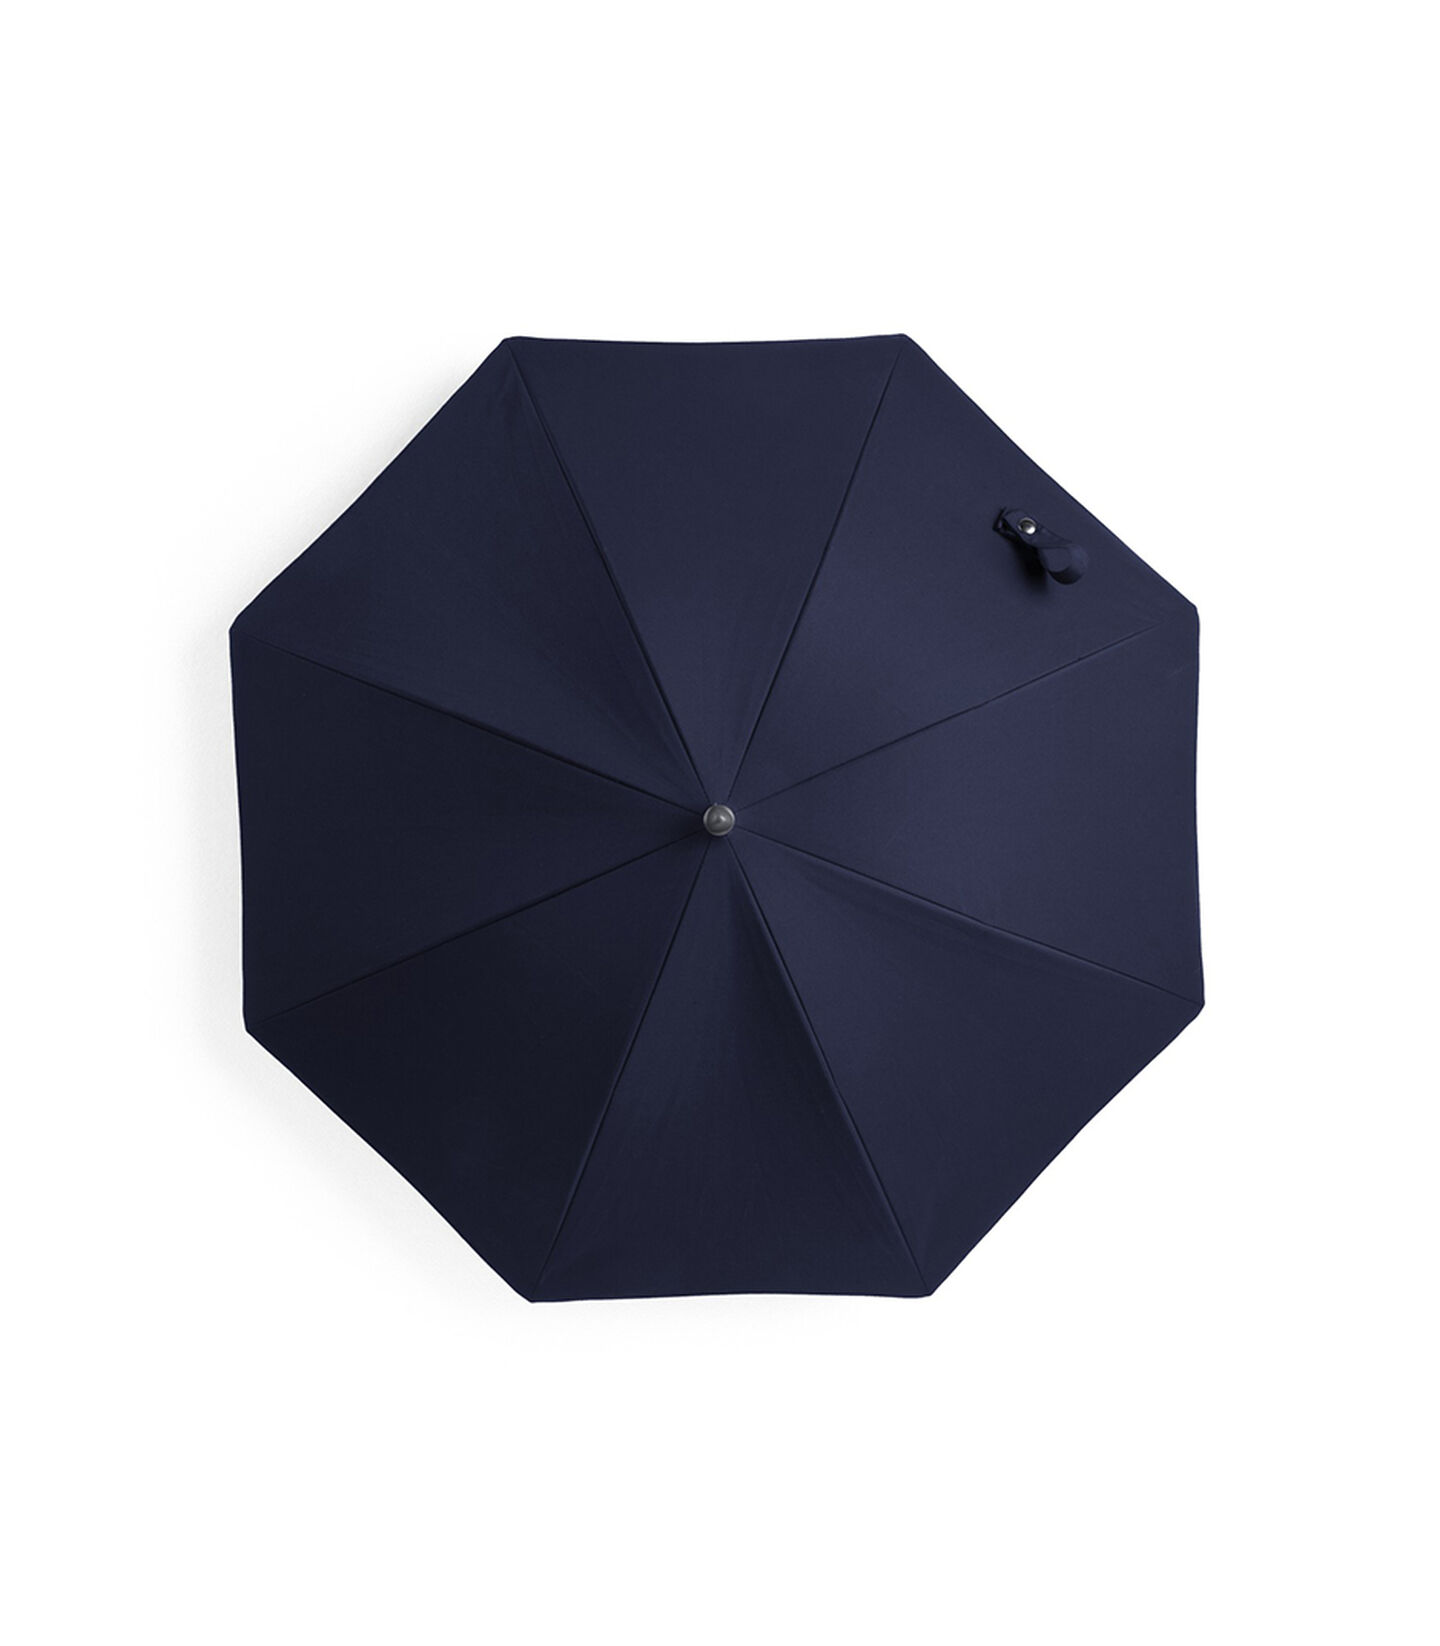 Stokke® Stroller Black Parasol Deep Blue, Deep Blue, mainview view 2